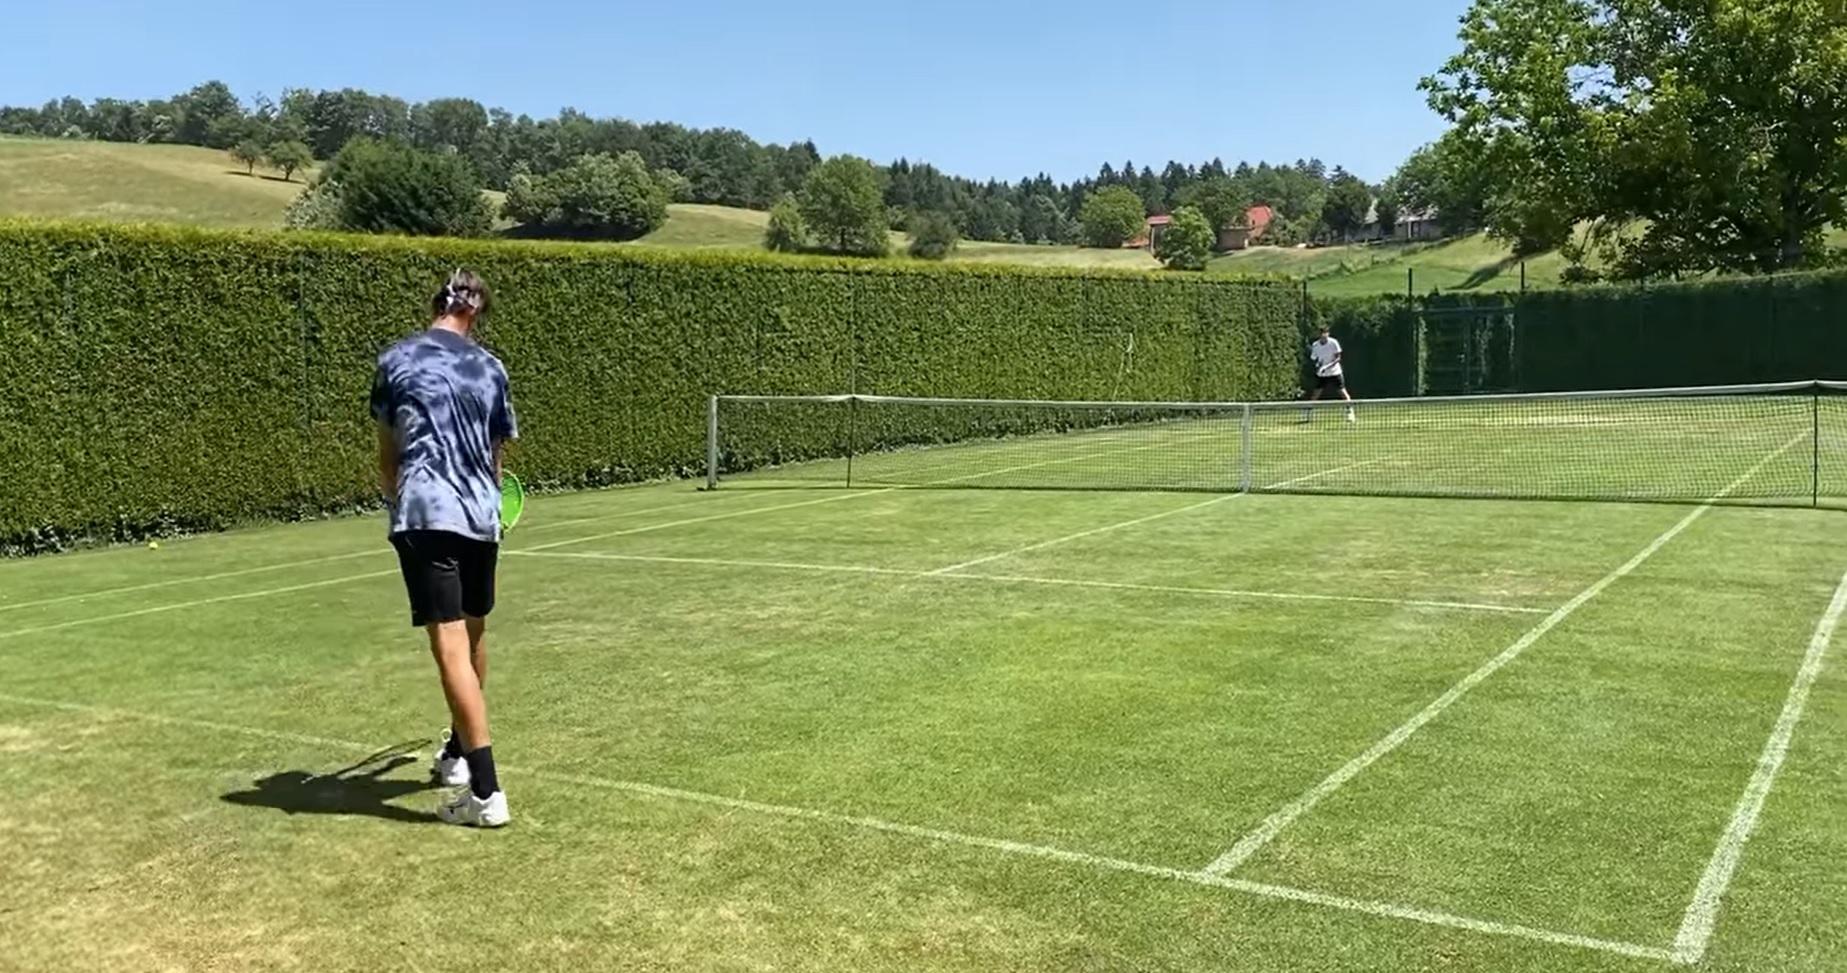 Seba trava - Slovenija v Wimbledonu s svojim predstavnikom tudi v mladinski konkurenci